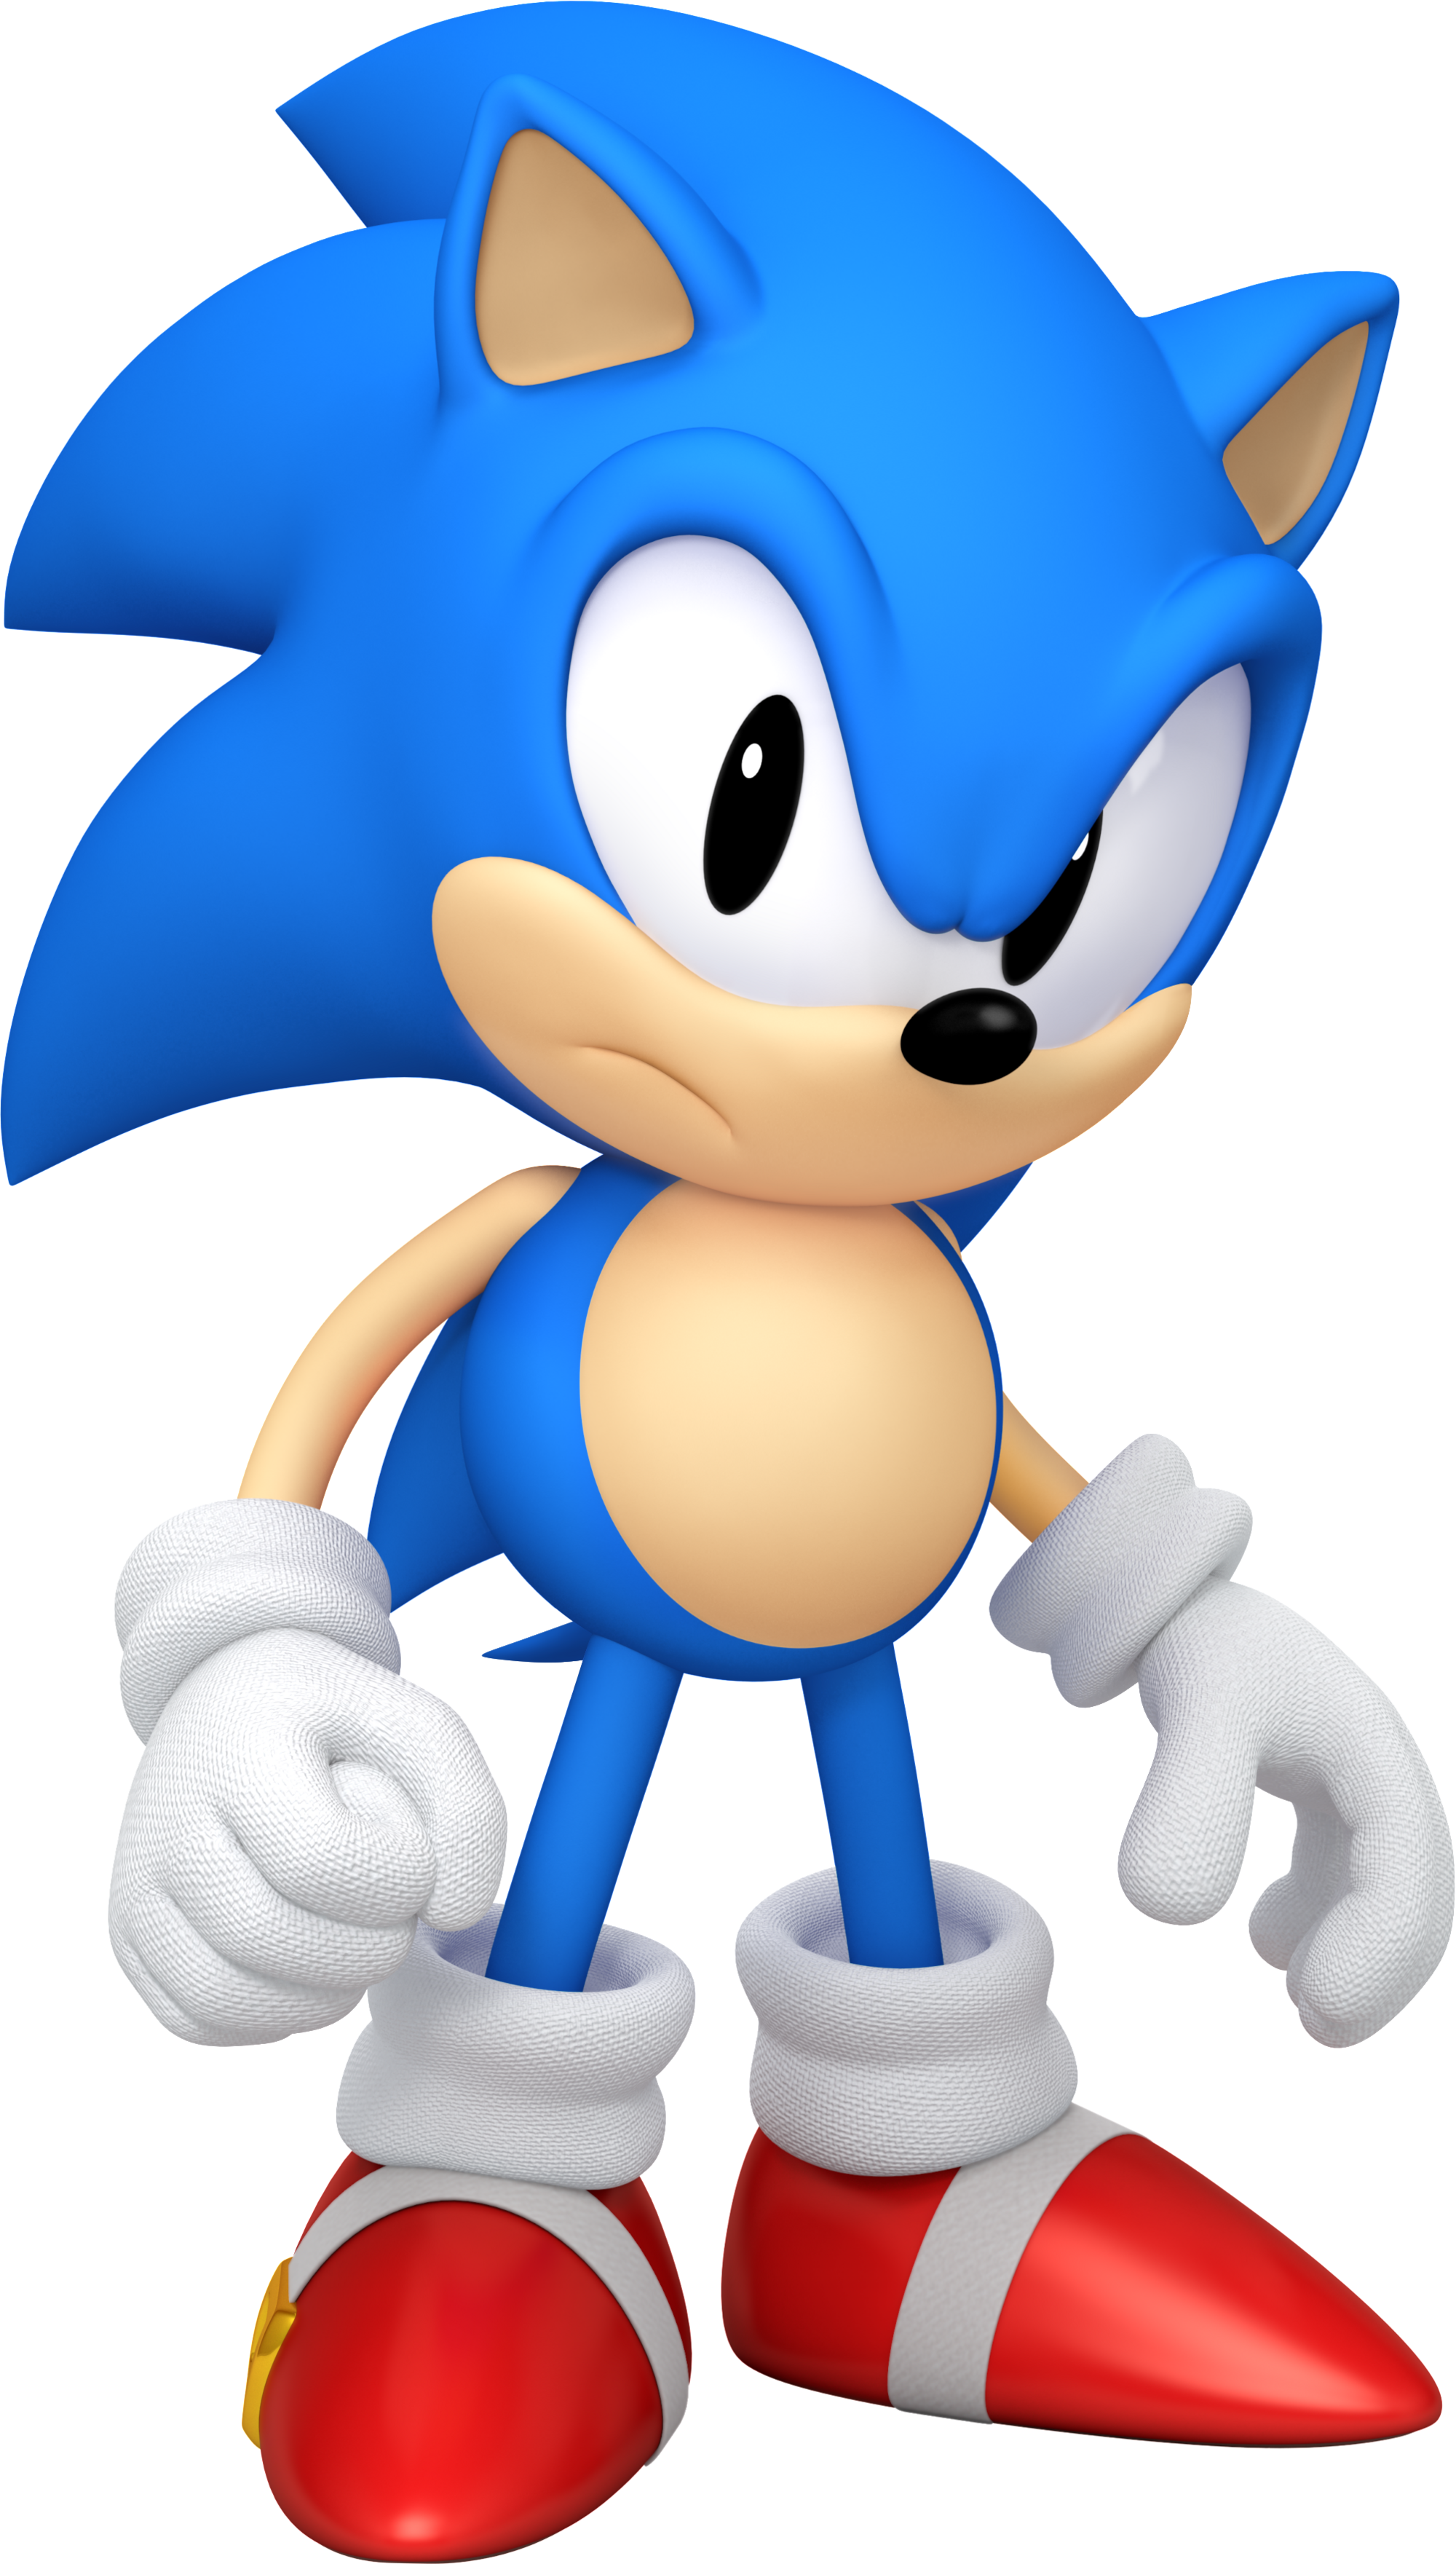 sonic the hedgehog - photo #40